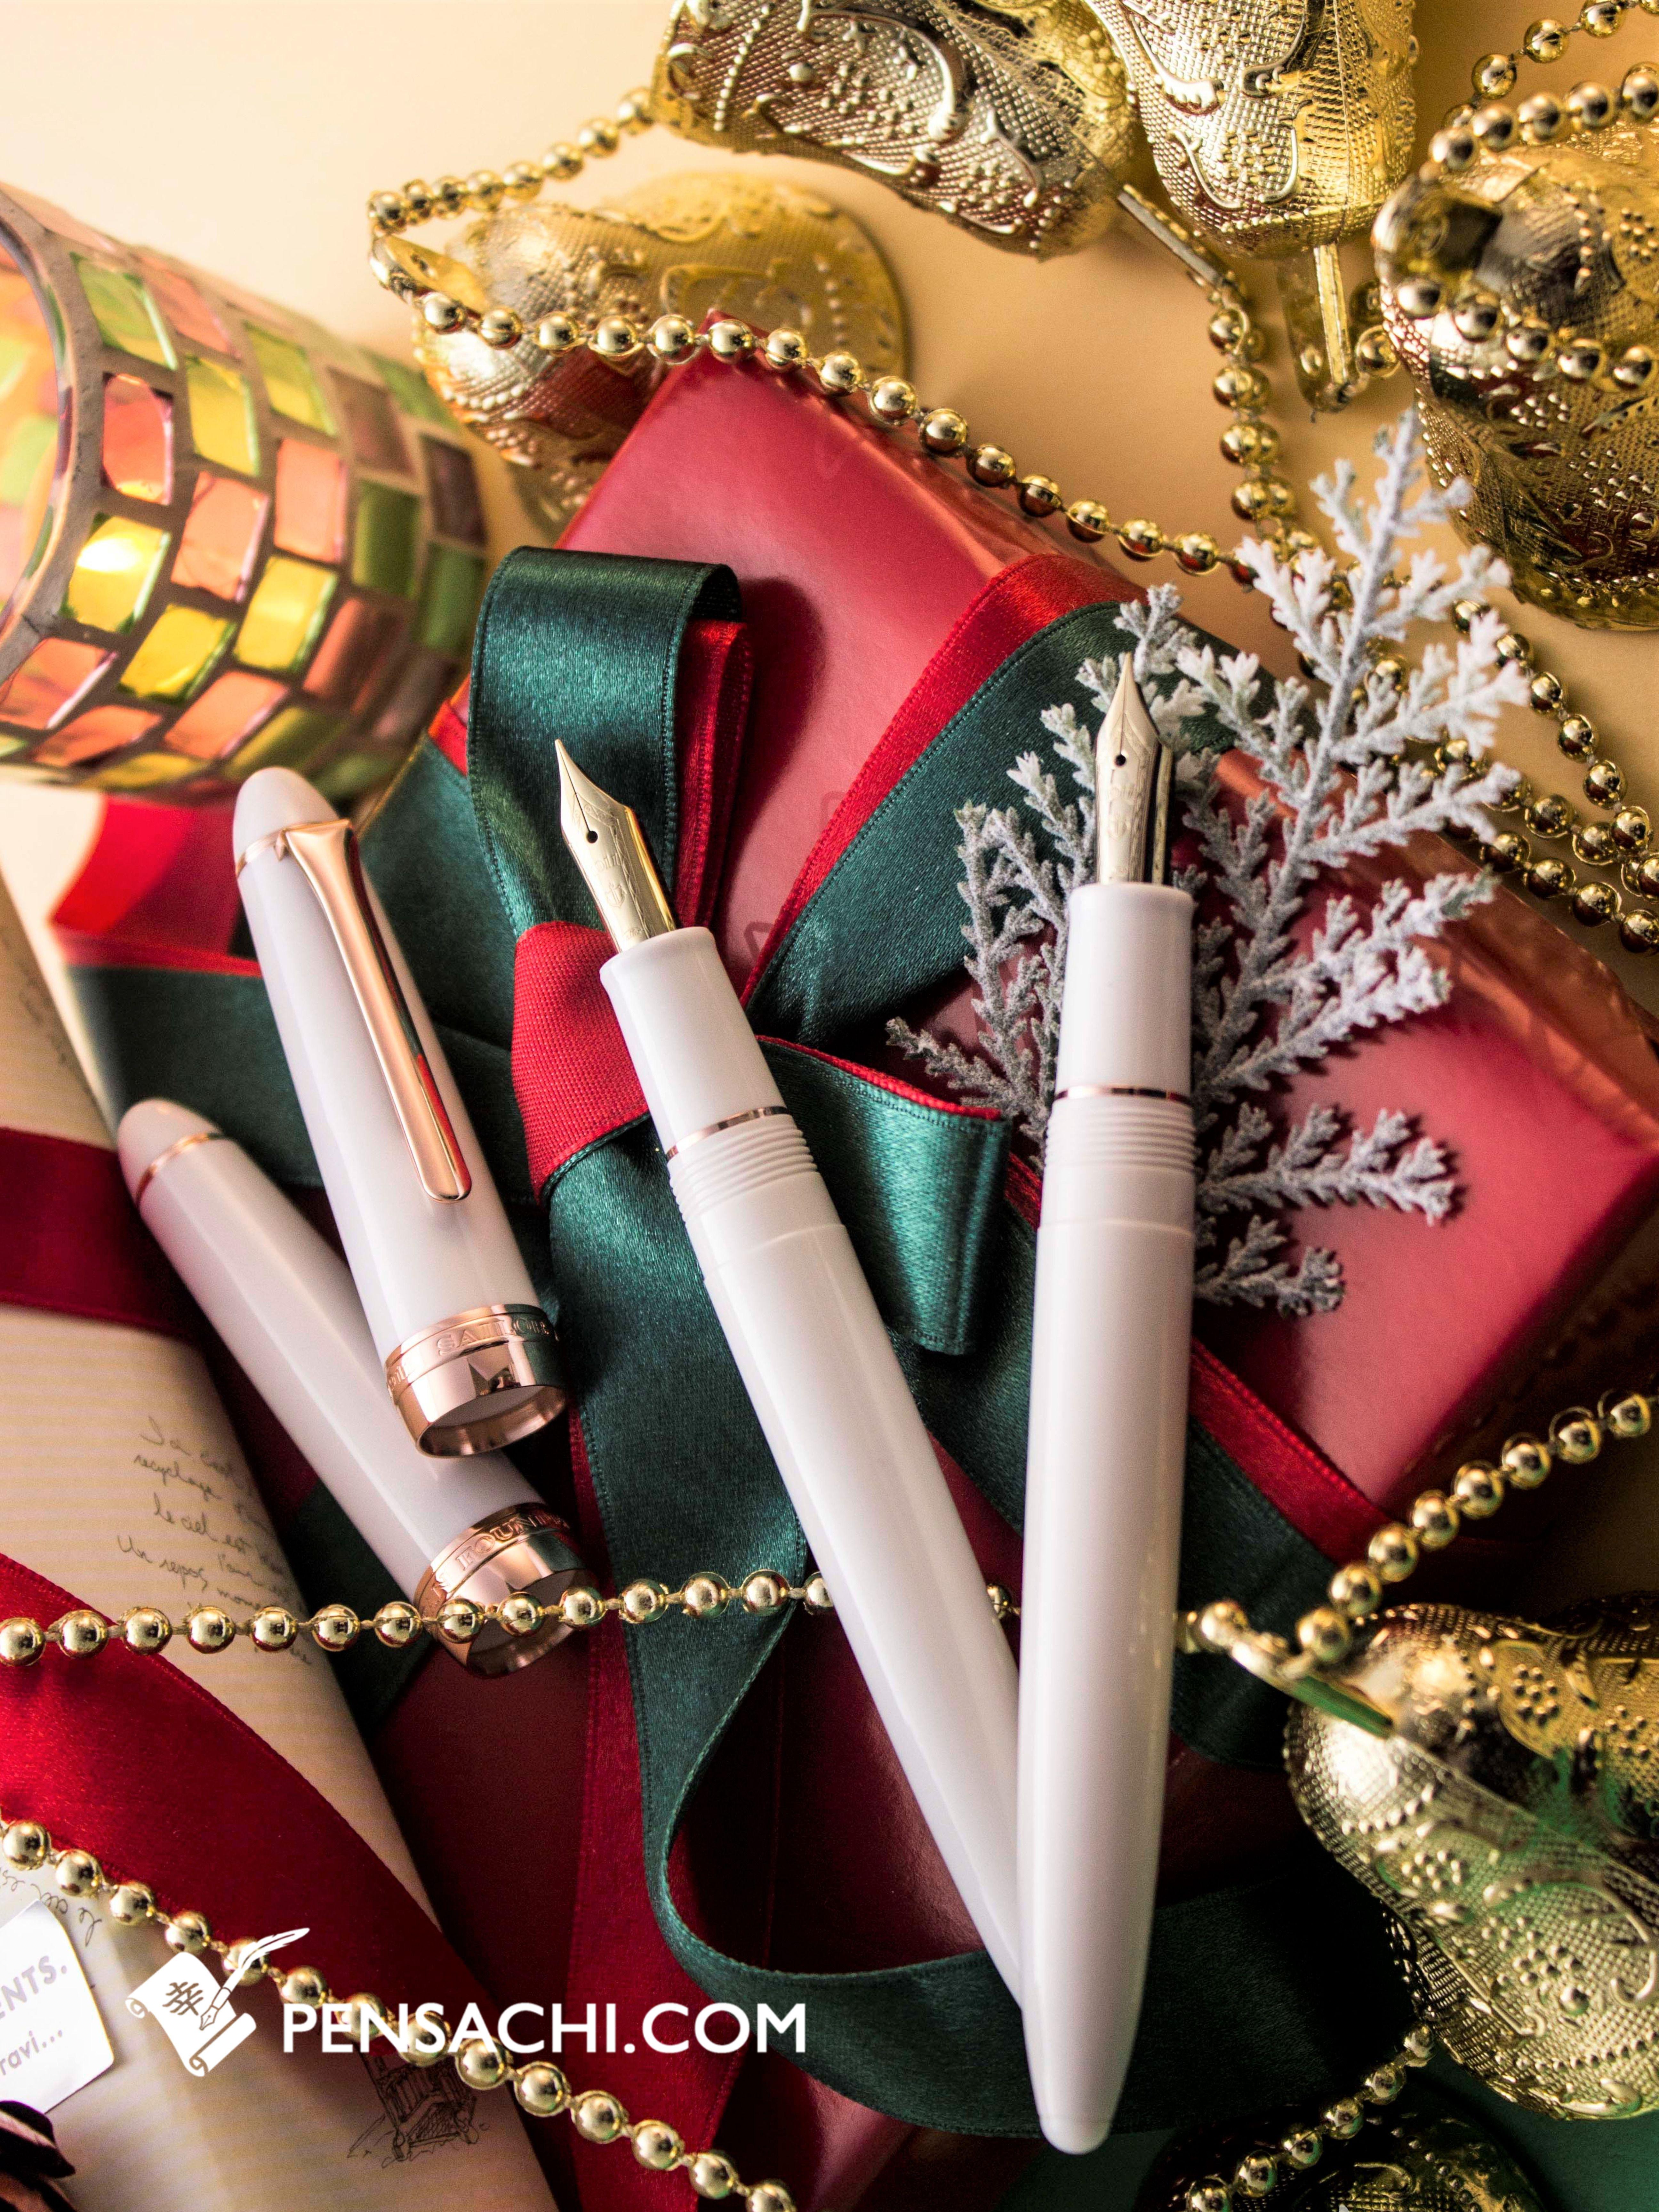 SAILOR Fasciner Fountain Pen - Pearl White | Xmas Gift Ideas